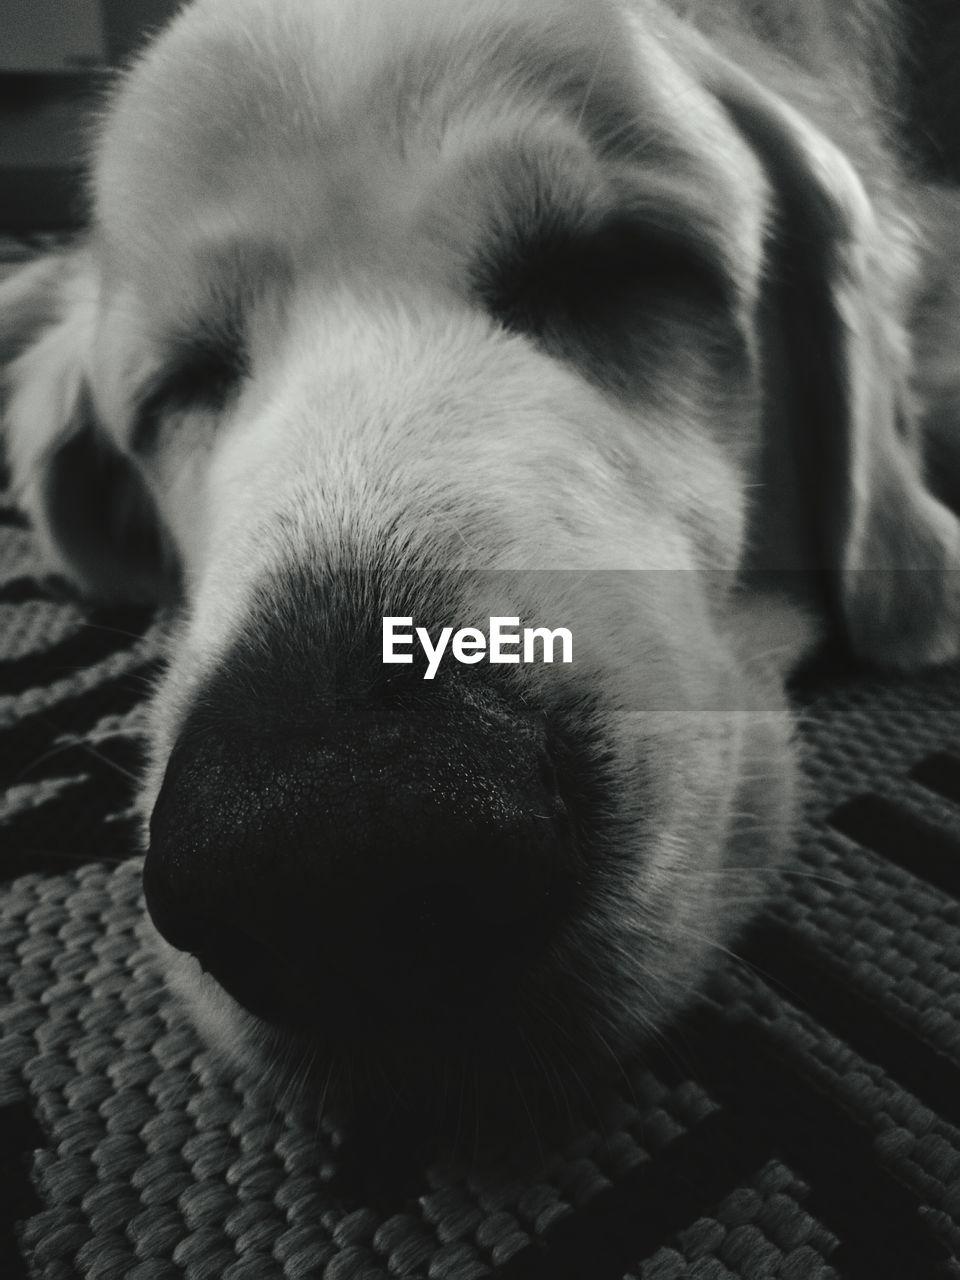 dog, pets, one animal, domestic animals, animal themes, mammal, close-up, animal head, indoors, no people, animal nose, day